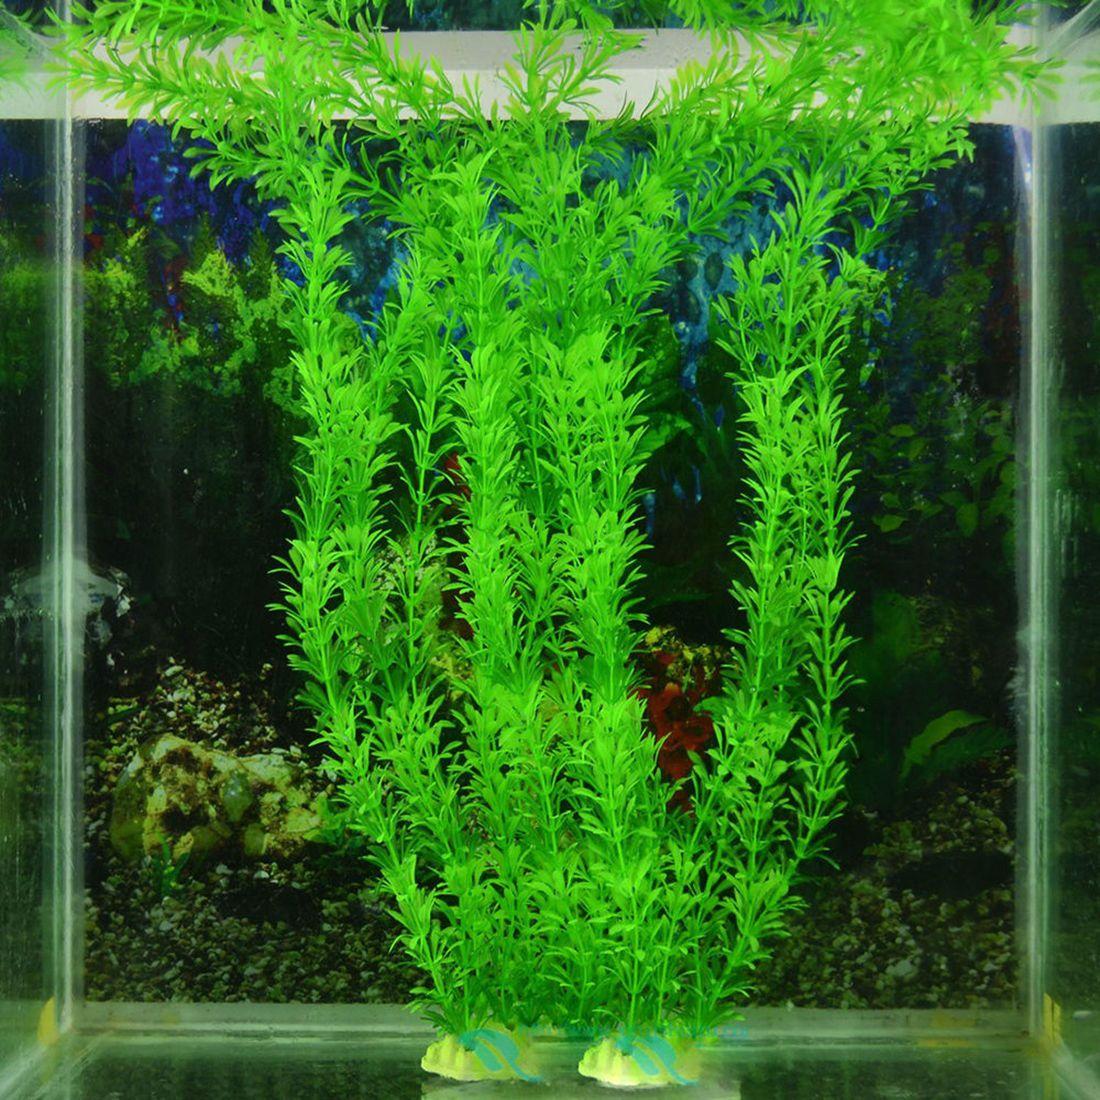 Awesome ornament artificial green plant grass for fish tank aquarium